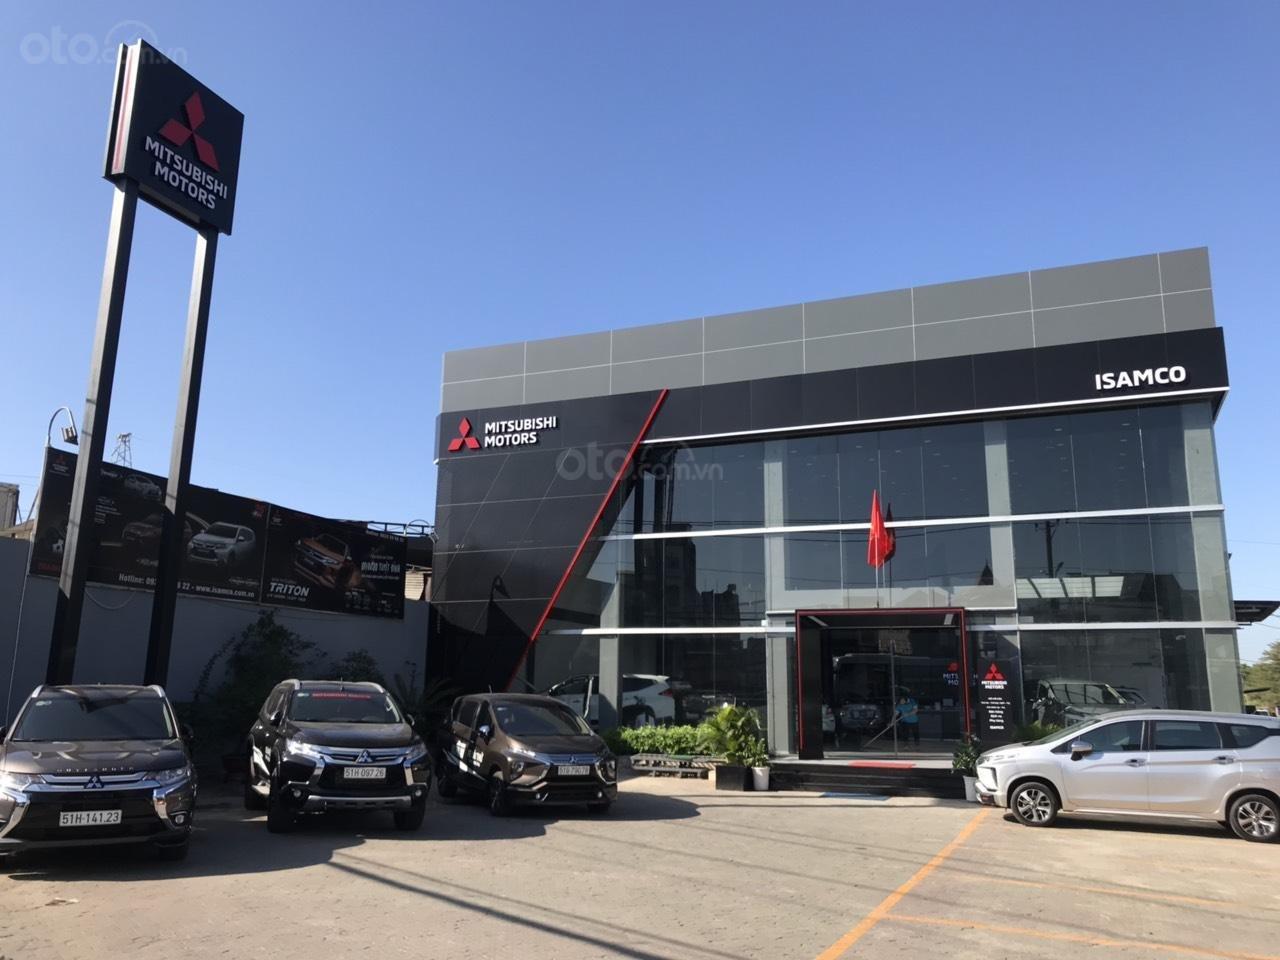 Mitsubishi Isamco Bình Triệu (1)